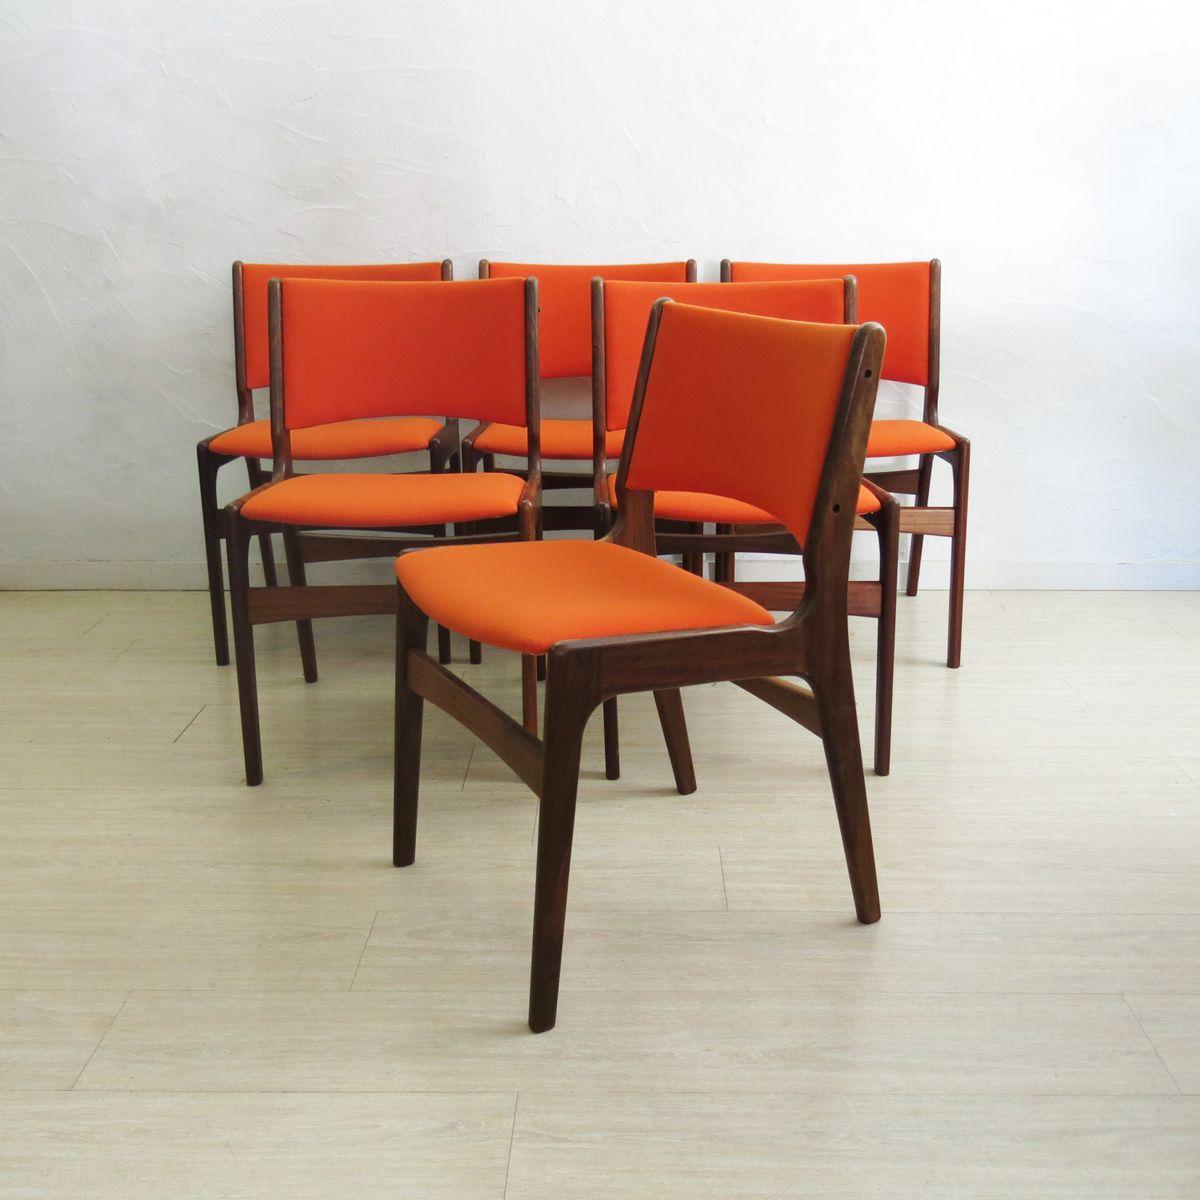 teak dining chairs   Mid Century Danish  DownloadSet Of 6 Mid Century Danish Modern Benny Linden Teak Dining Chairs. Mid Century Teak Dining Table And Chairs. Home Design Ideas